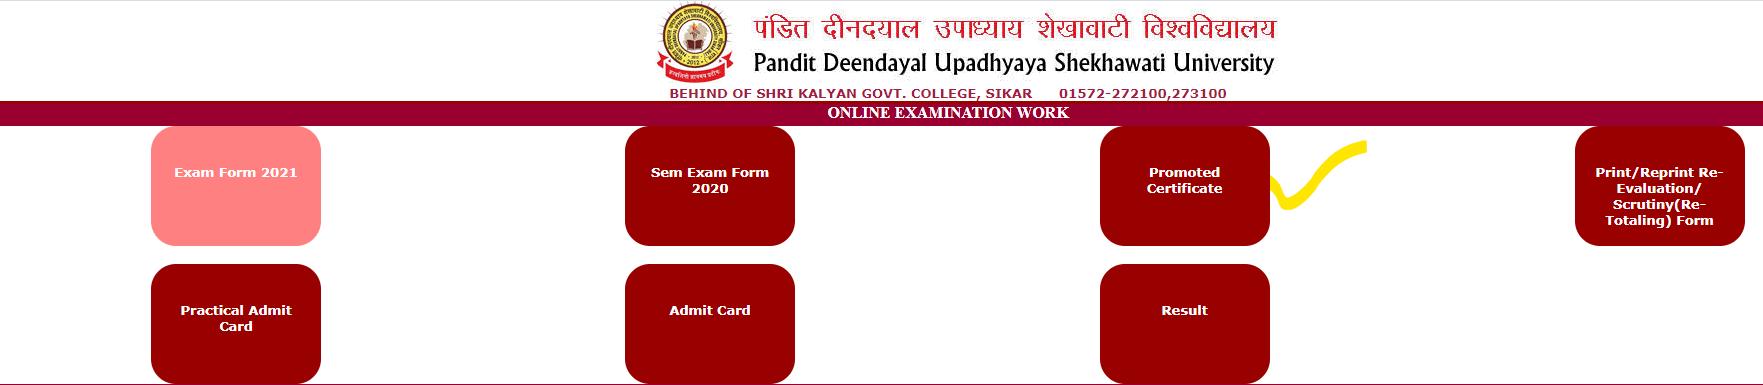 PDUSU UG PG Promote certificate 2021 Released